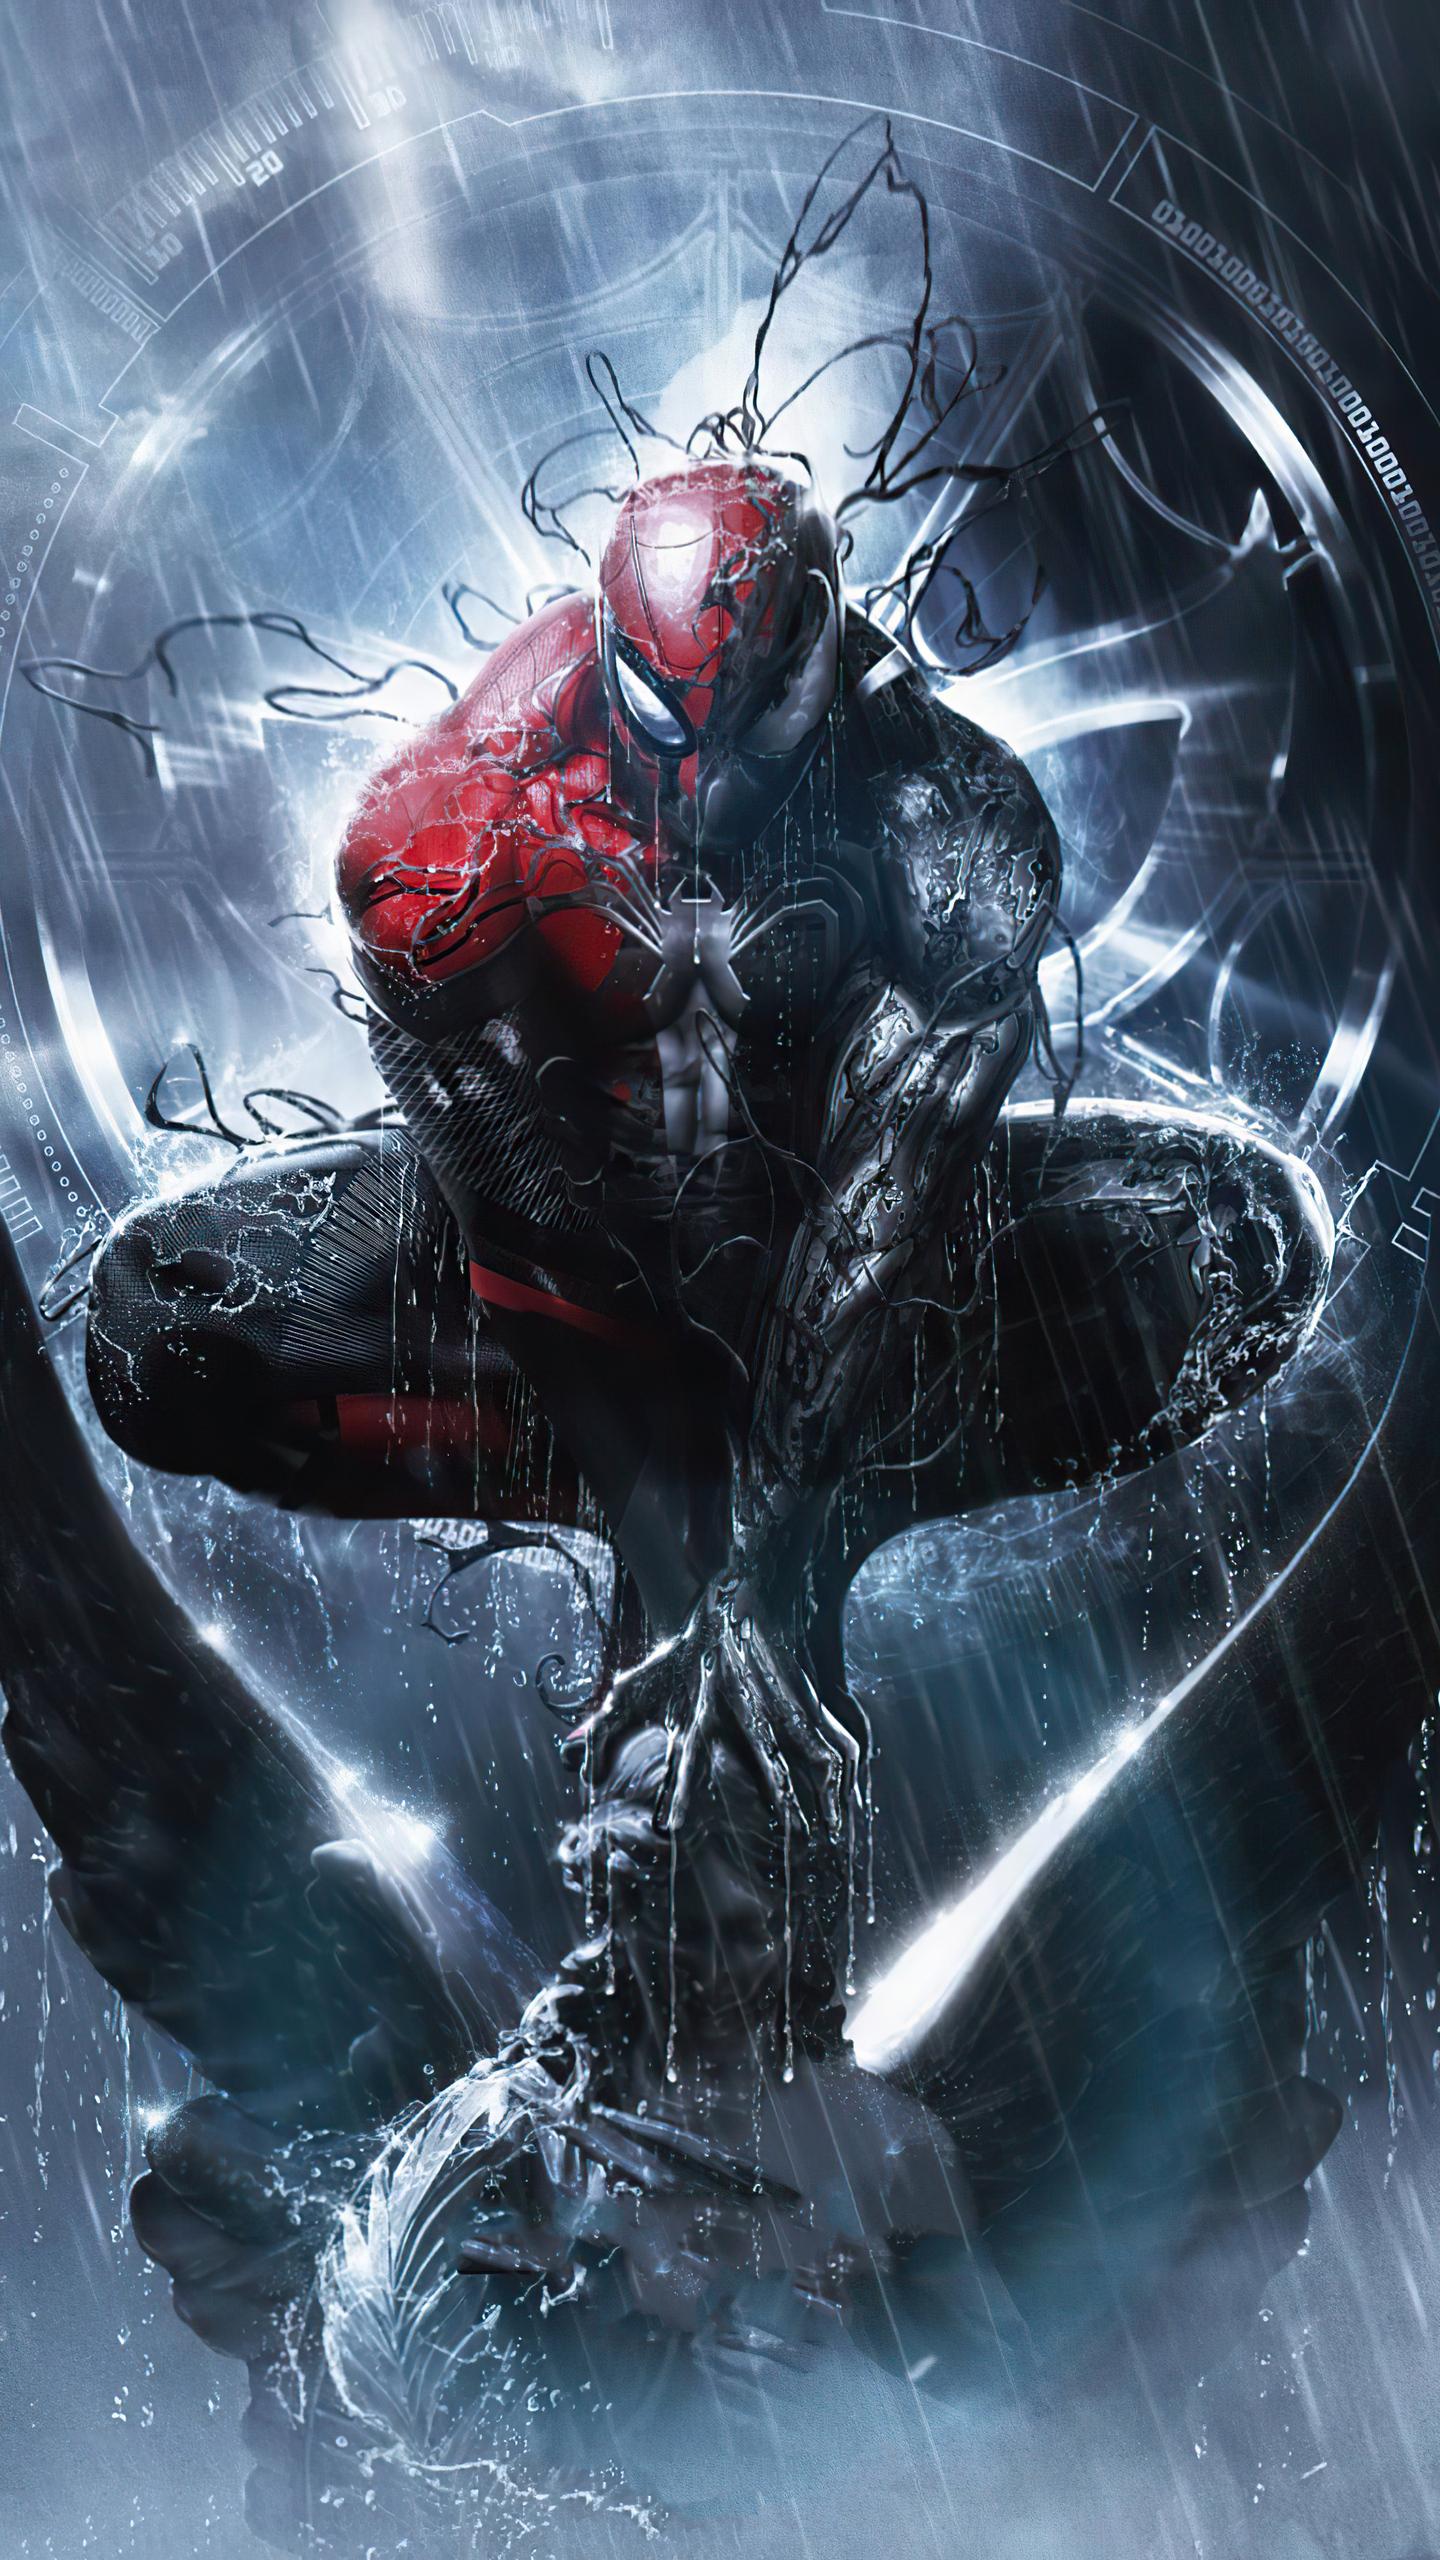 symbiote-spiderman-comic-book-series-4k-fz.jpg